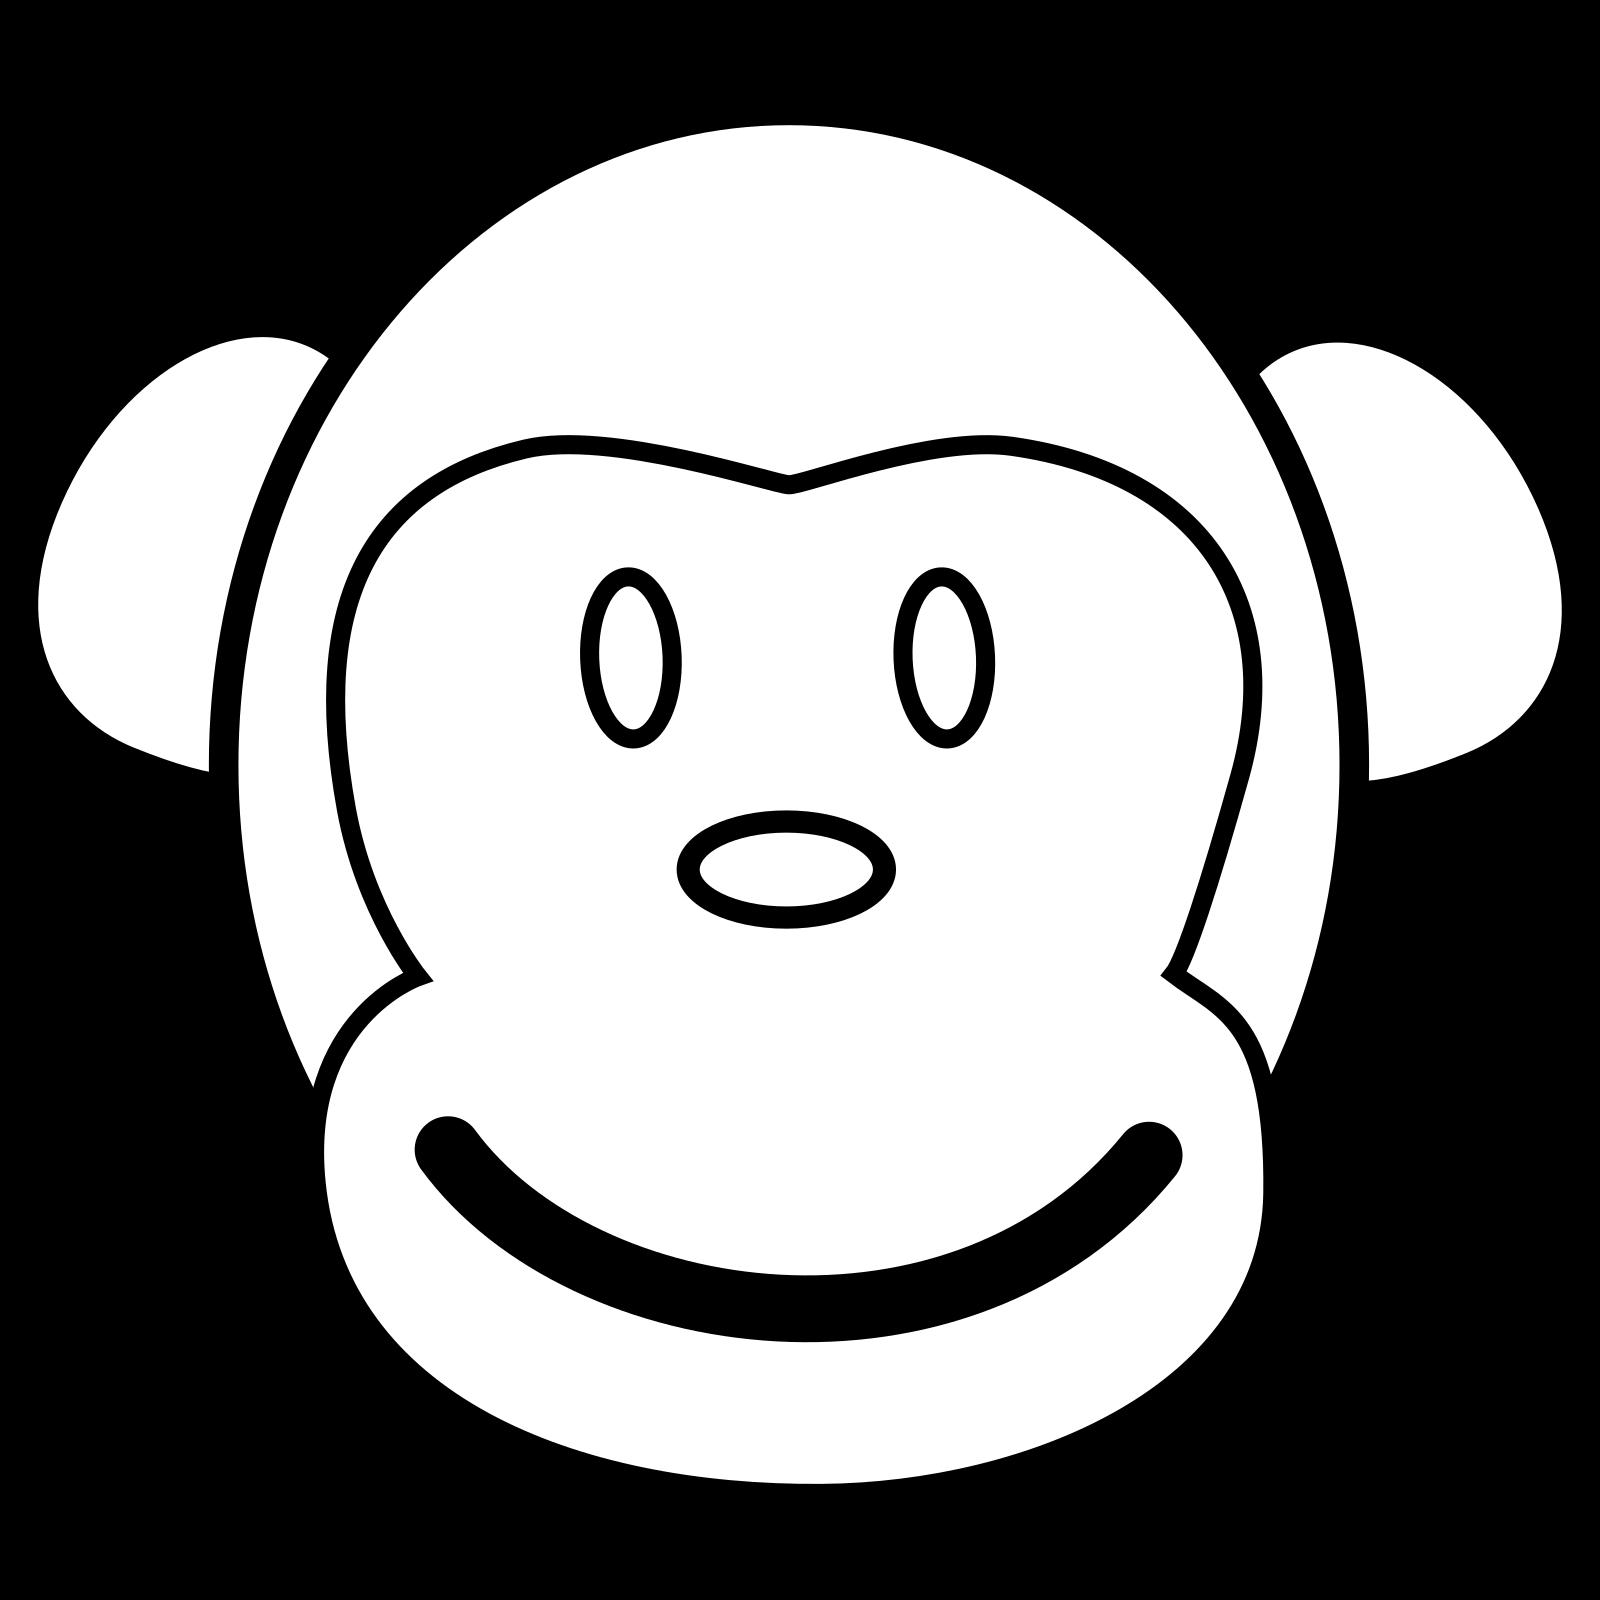 Monkey Face Svg Vector Monkey Face Clip Art Svg Clipart